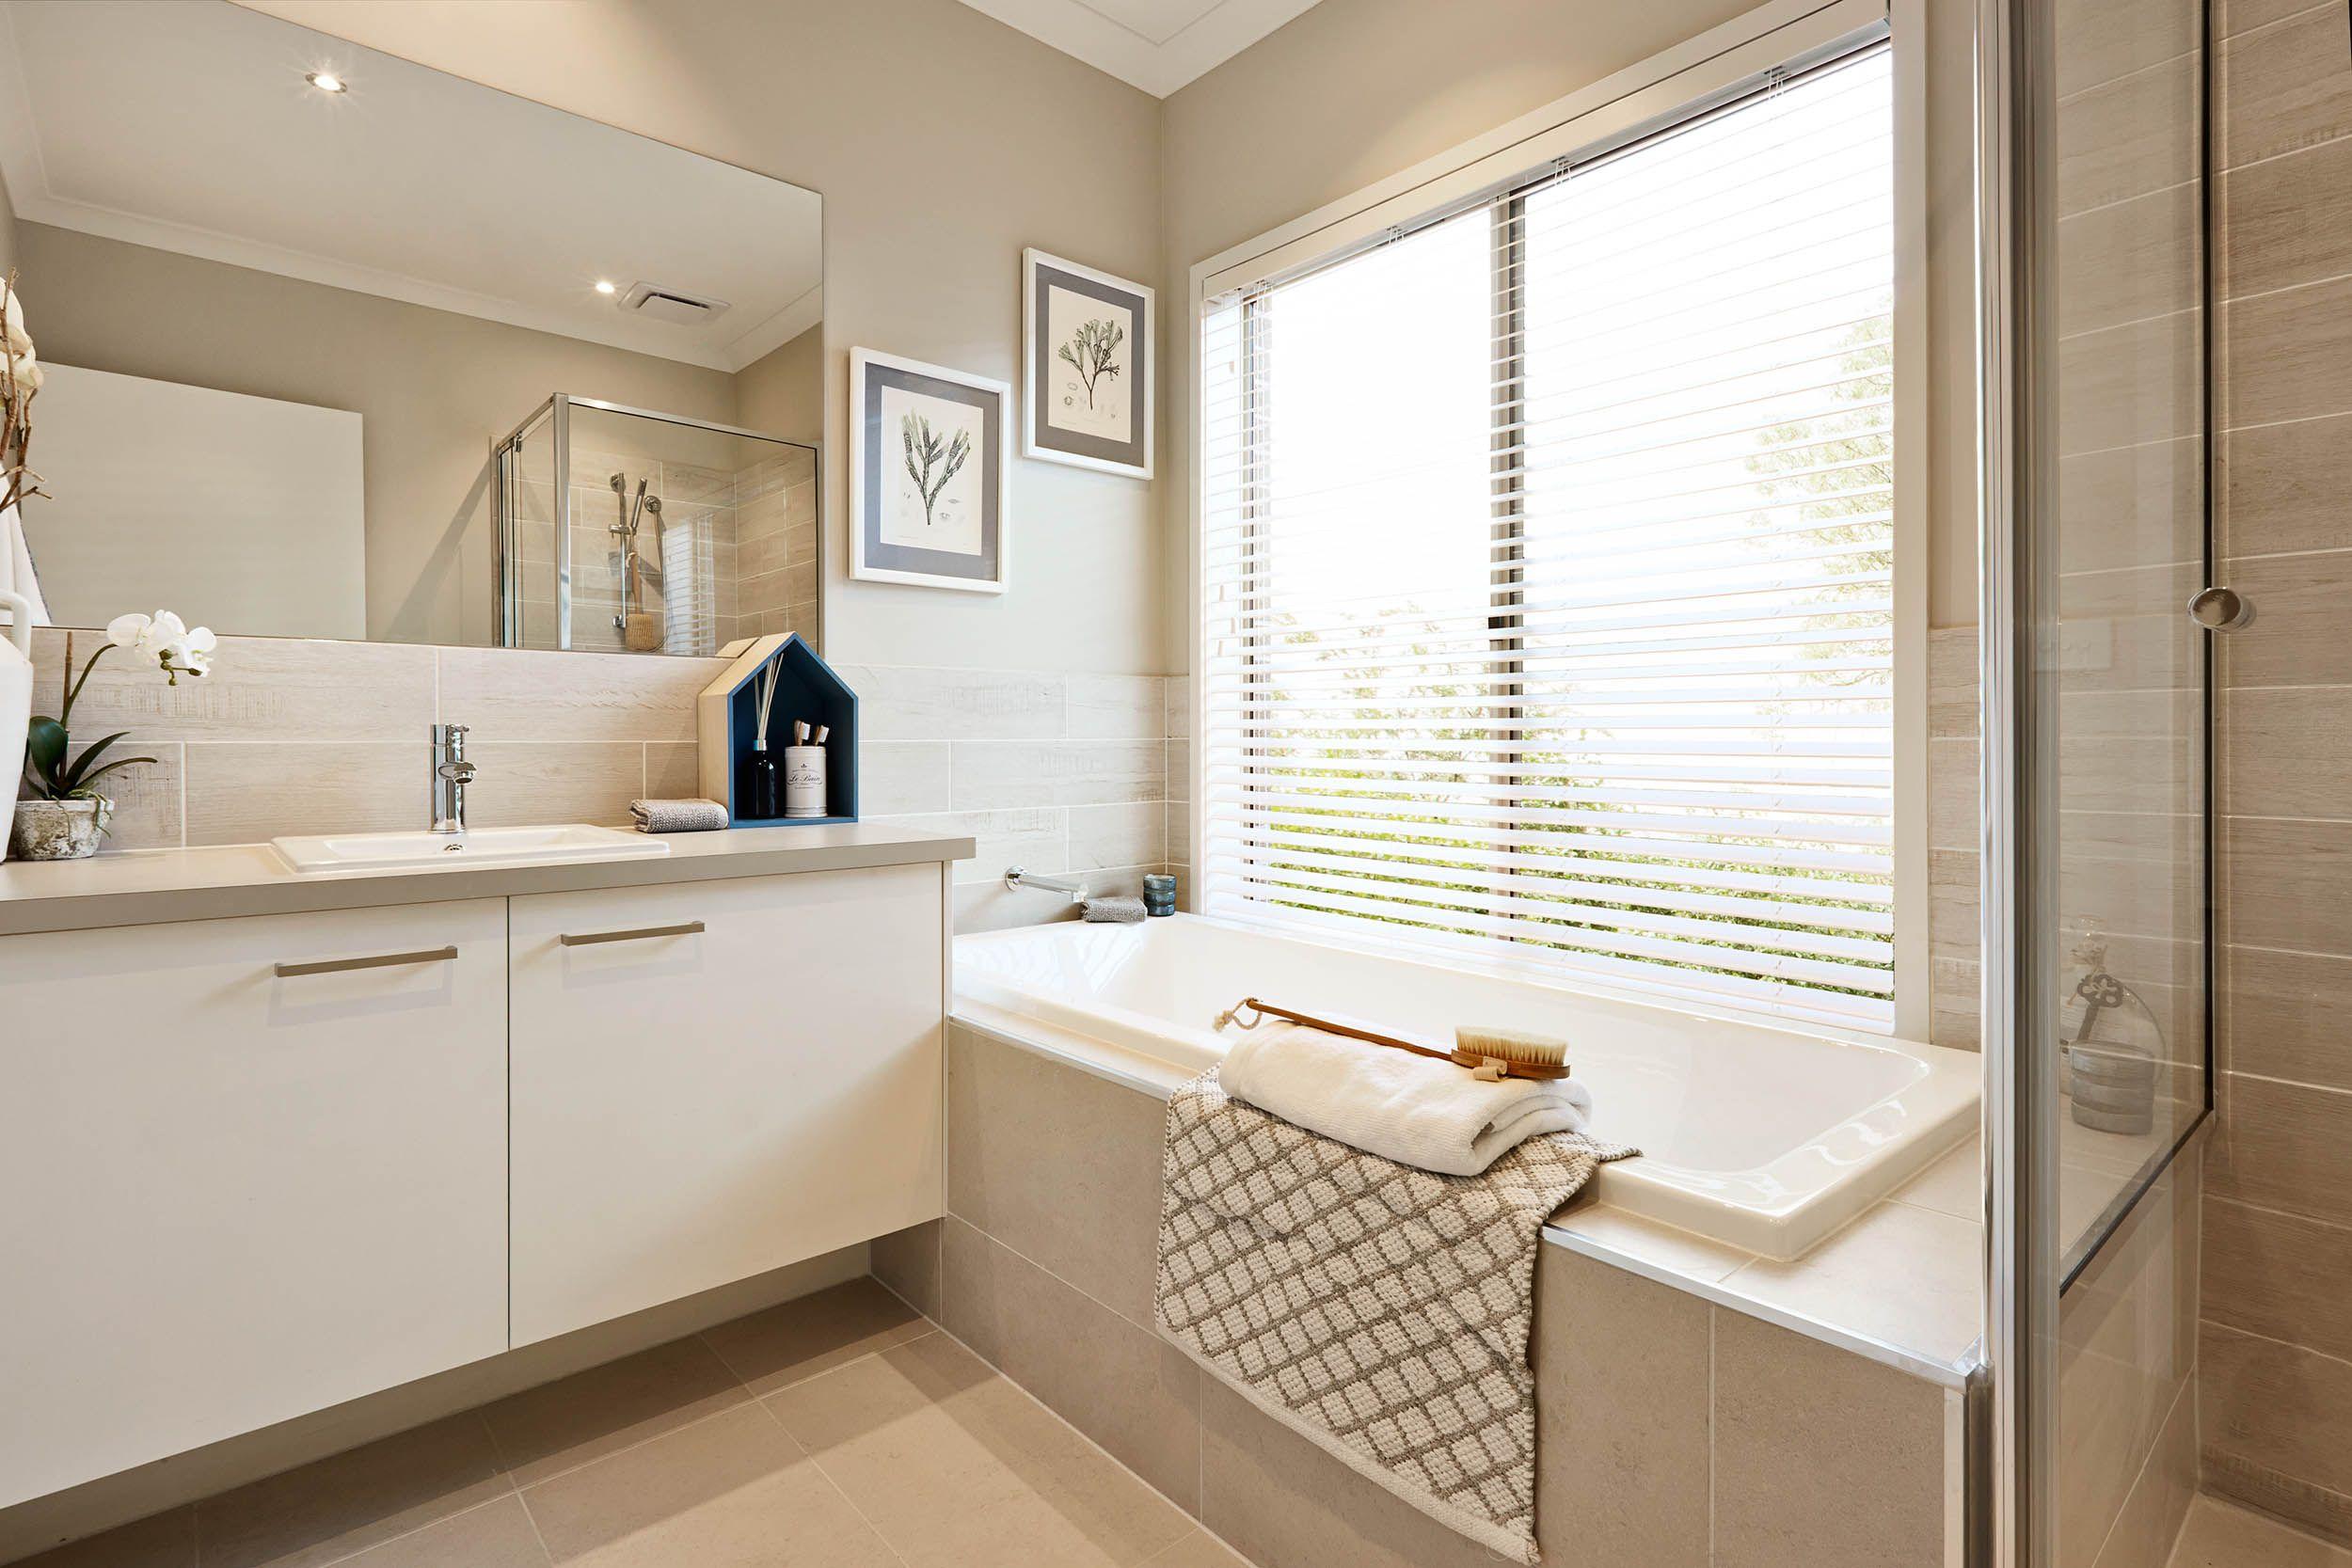 Bathroom Renovations Sunbury carlisle homes: embleton 29 - featured at rosenthal estate